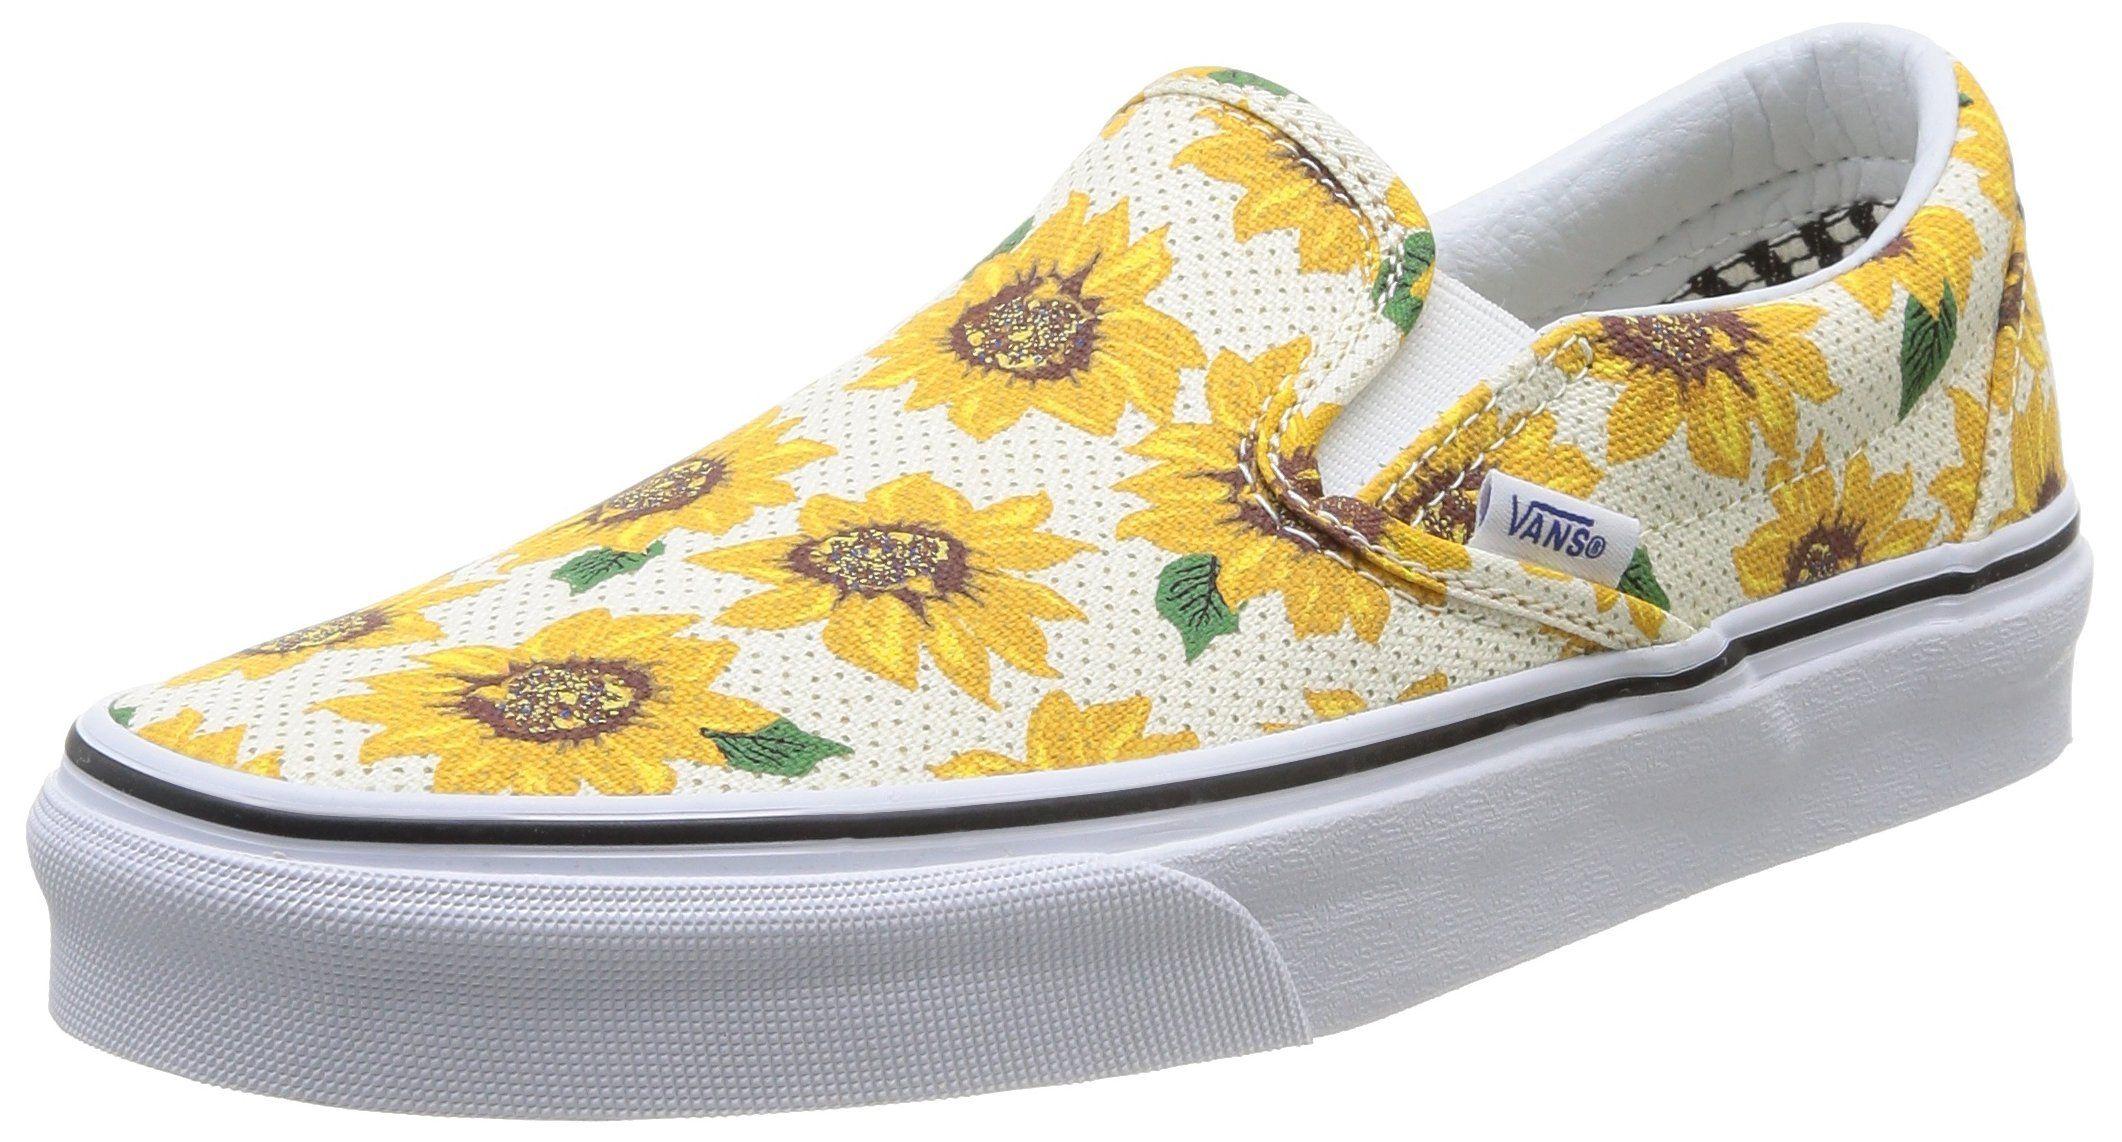 Antecedente competencia Capilares  Amazon.com: Vans' Unisex Sunflower Slip On: Clothing | Vans classic slip on,  Slip on shoes, Vans